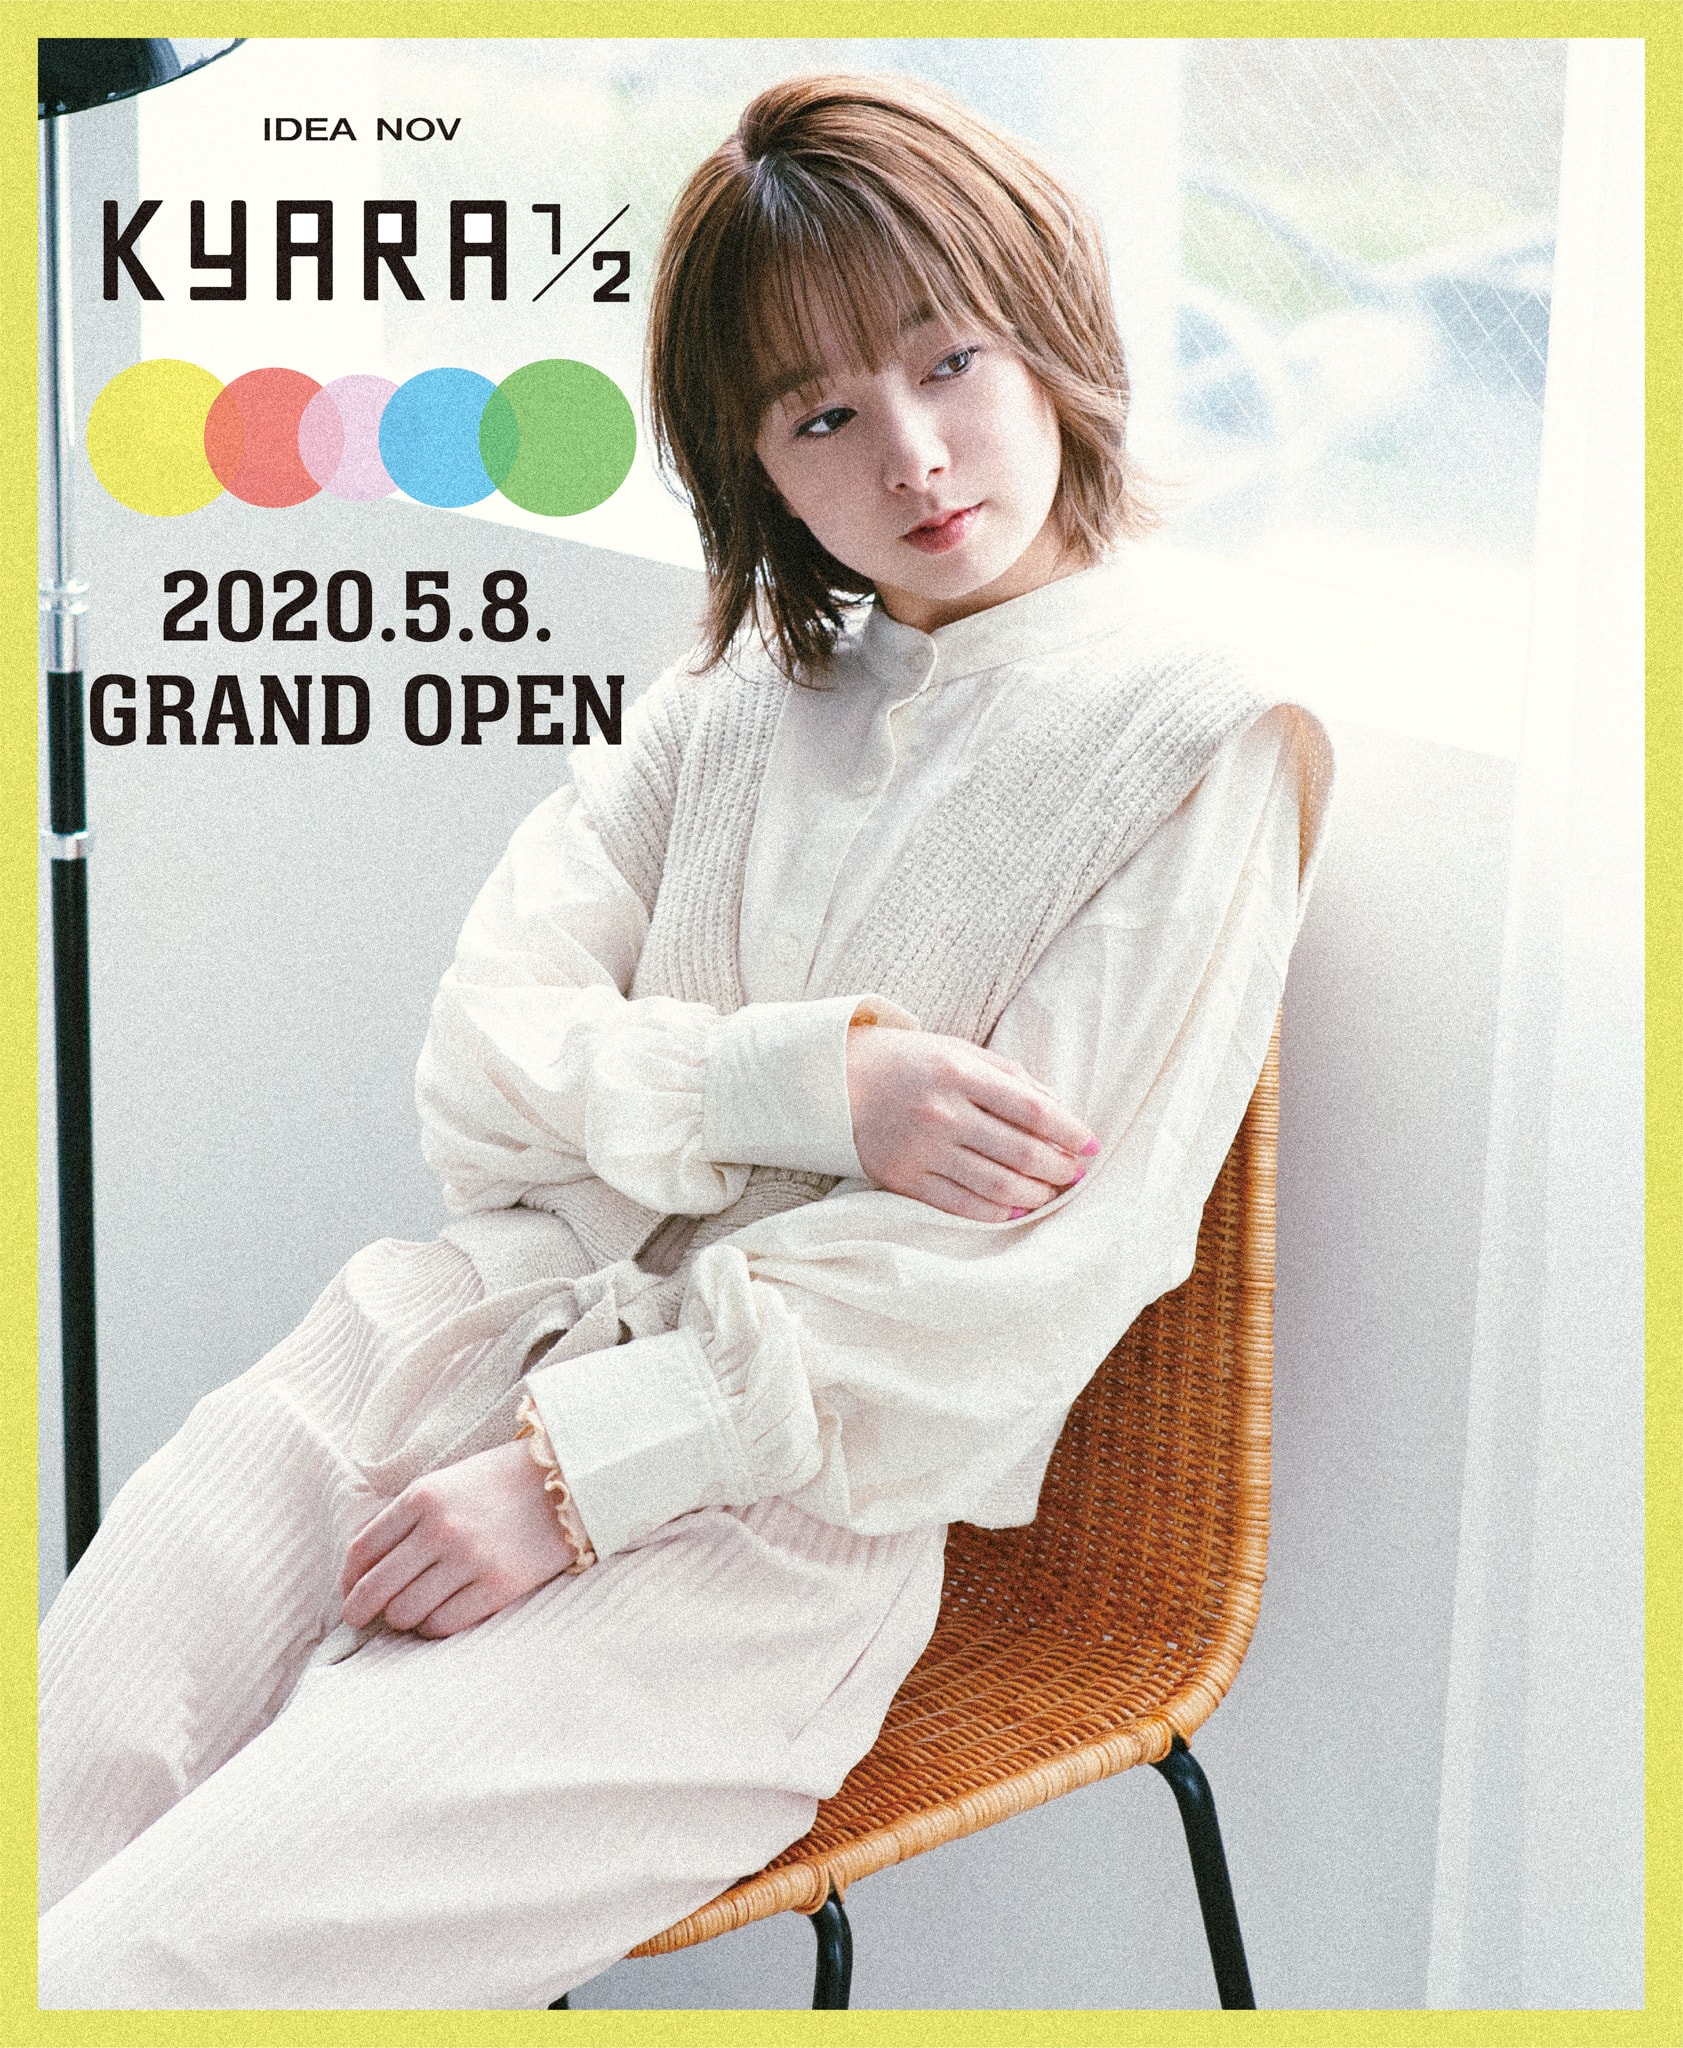 KYARA 1/2 GRAND OPEN